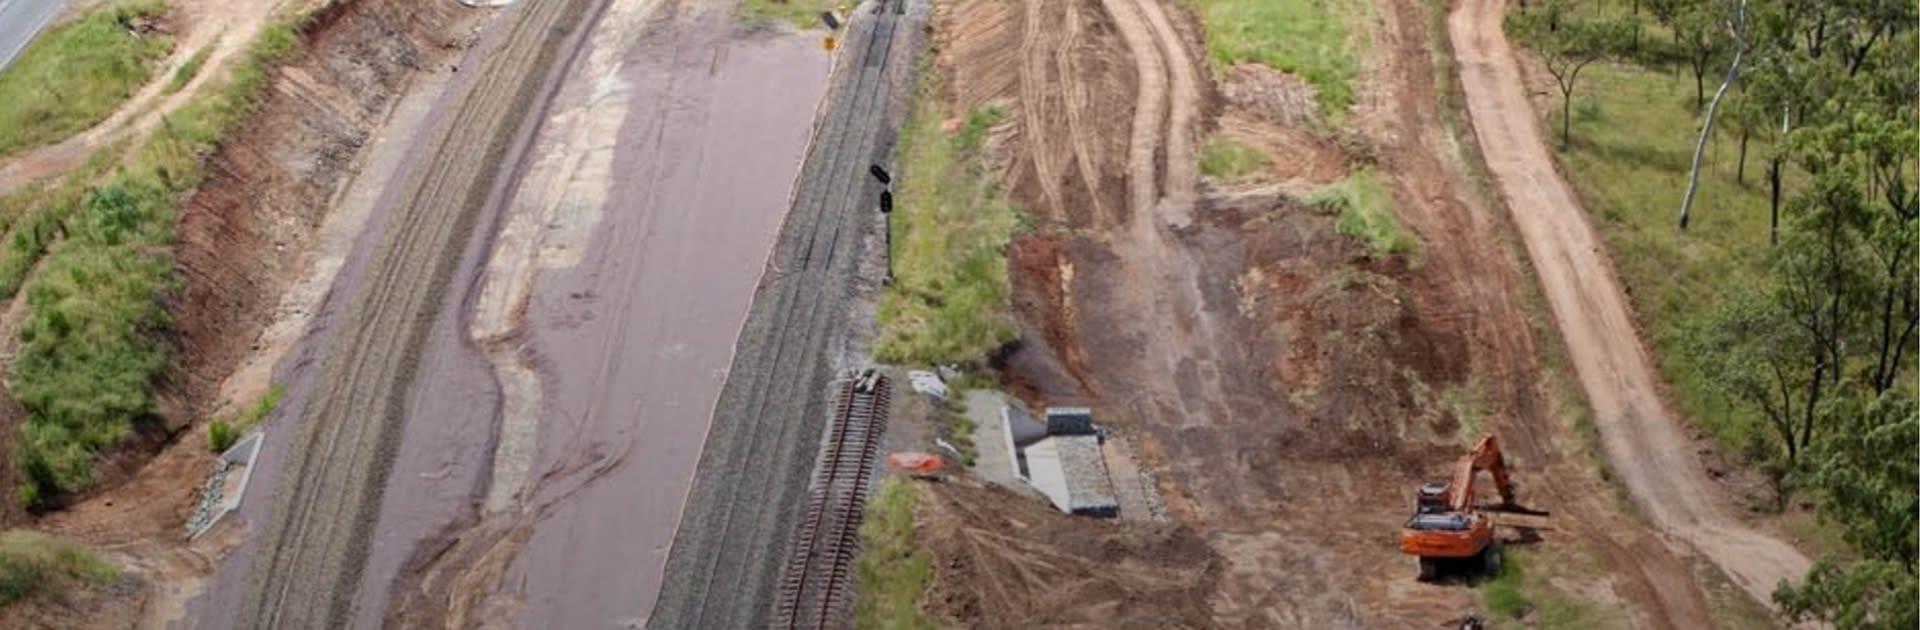 coalconnect-rail-construction-surveying